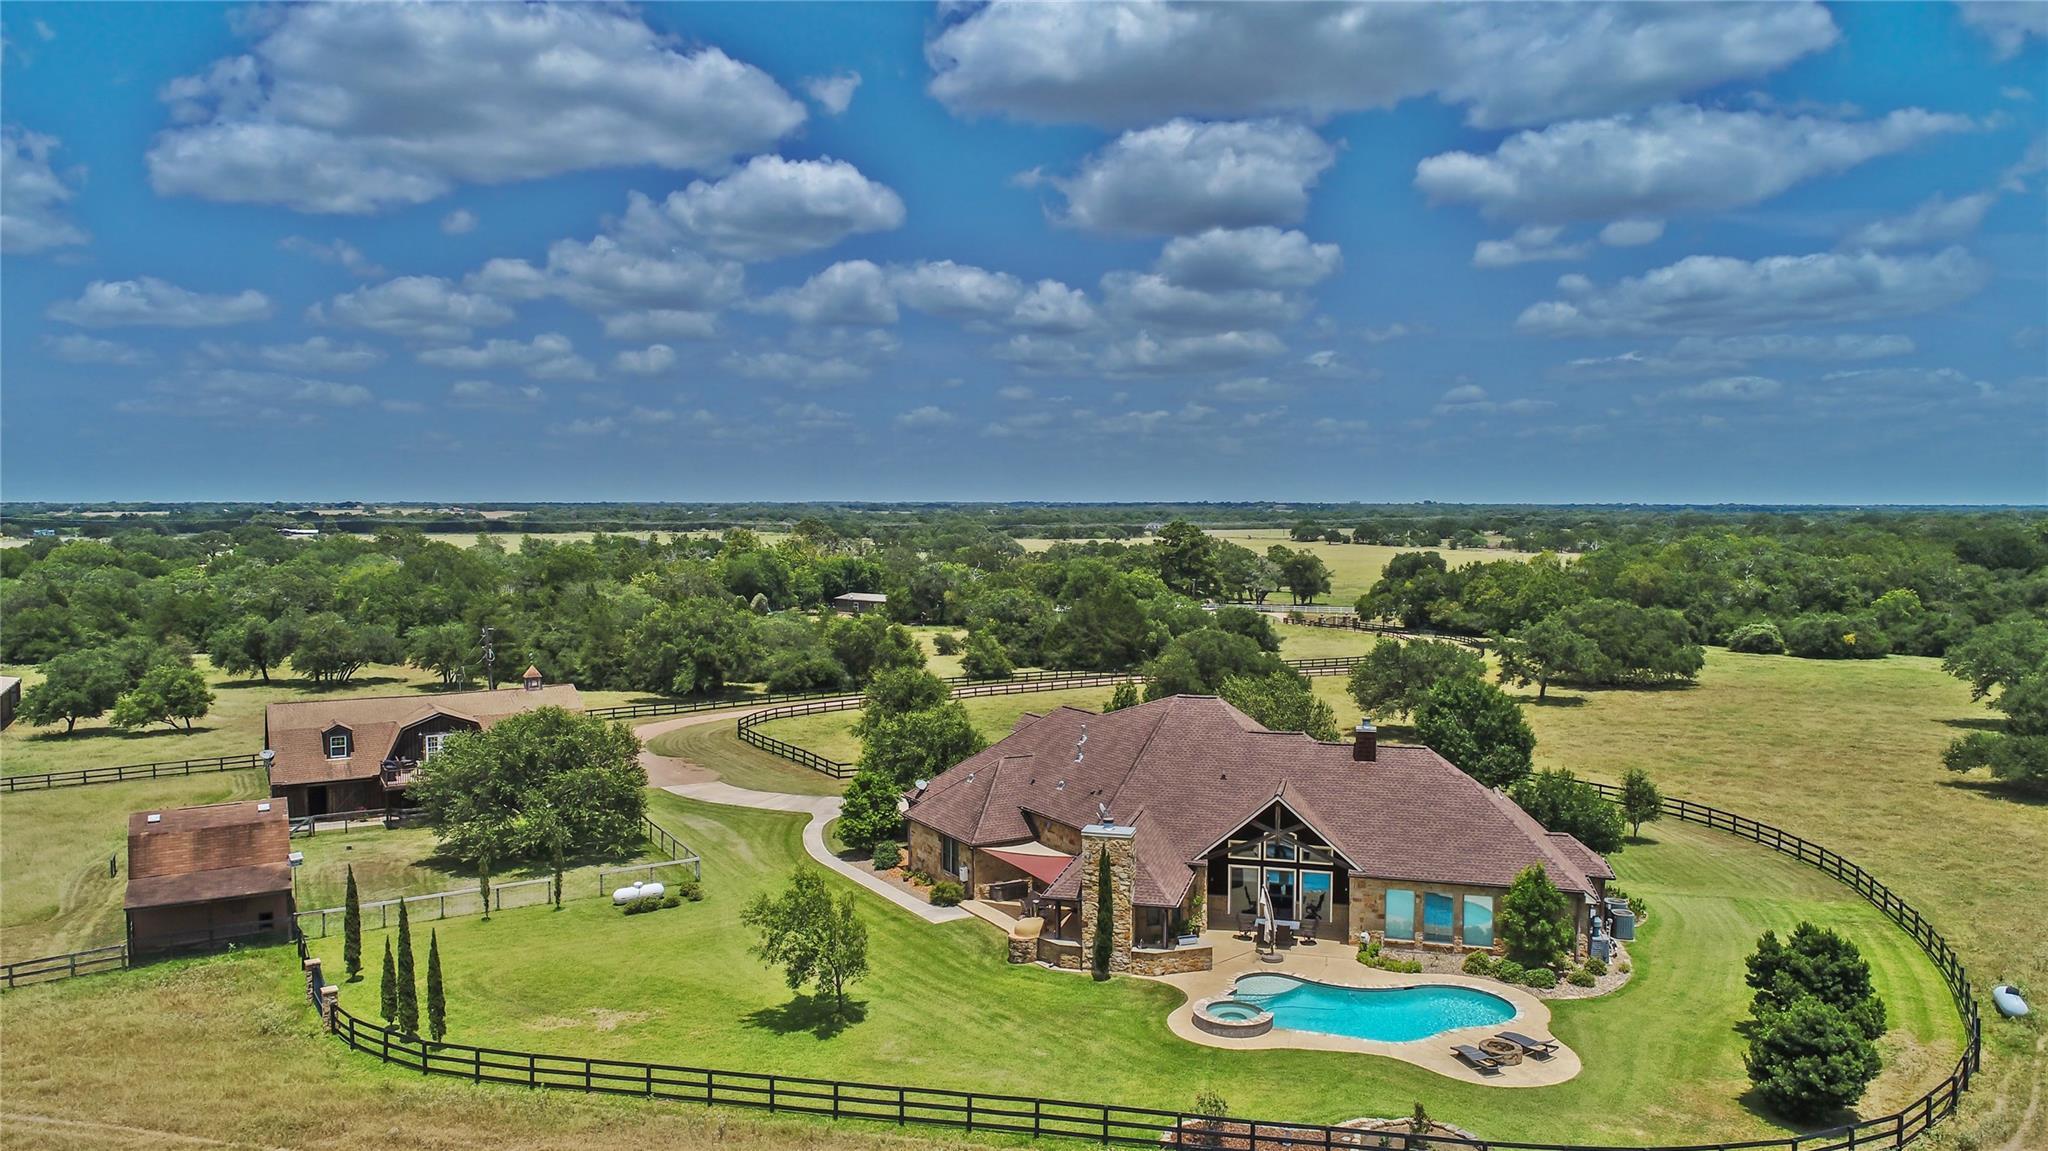 1328 Fm 682 Property Photo - Yoakum, TX real estate listing